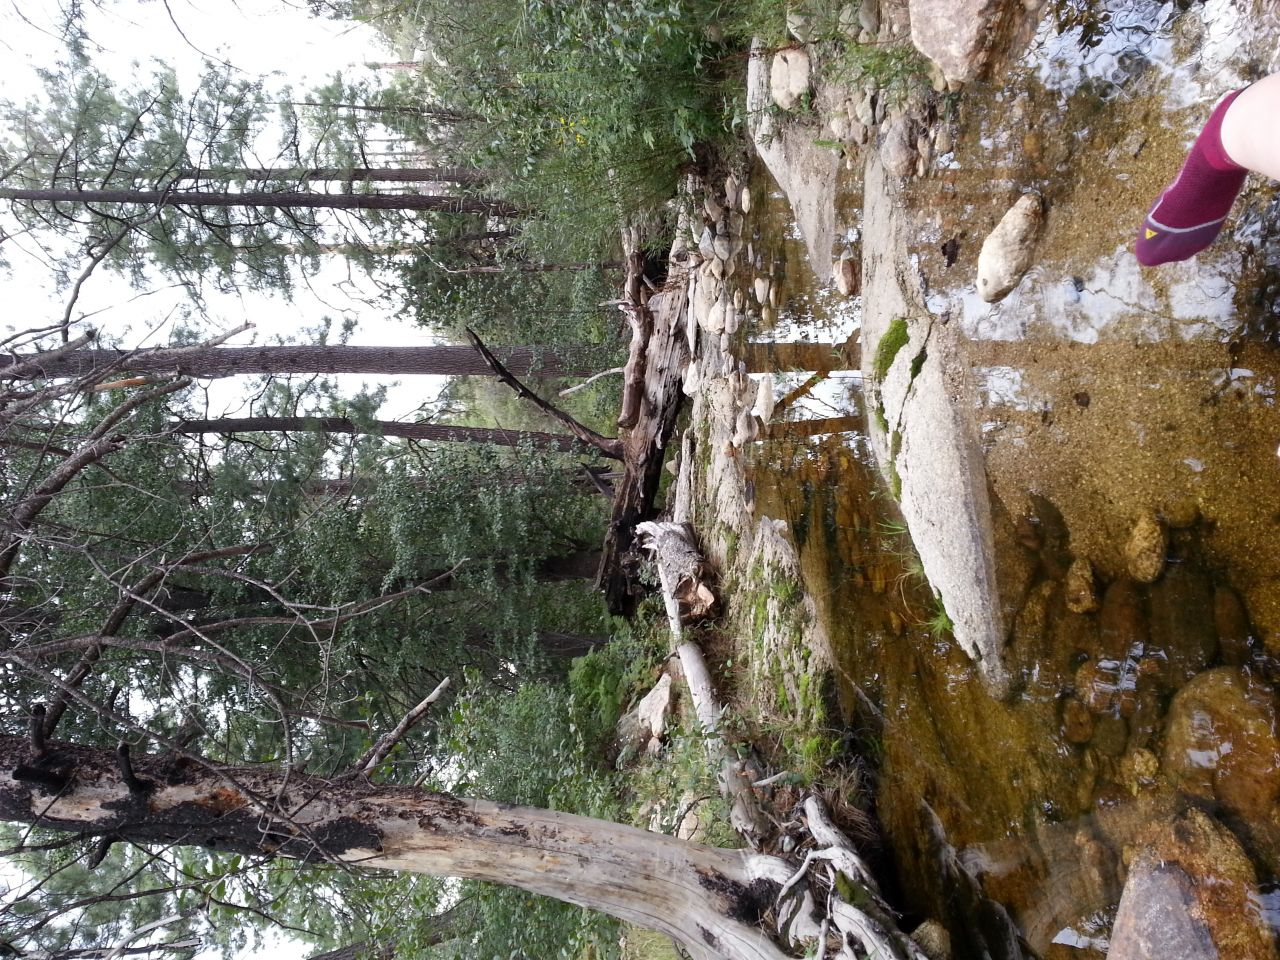 Wilderness Of Rocks, Tucson Az